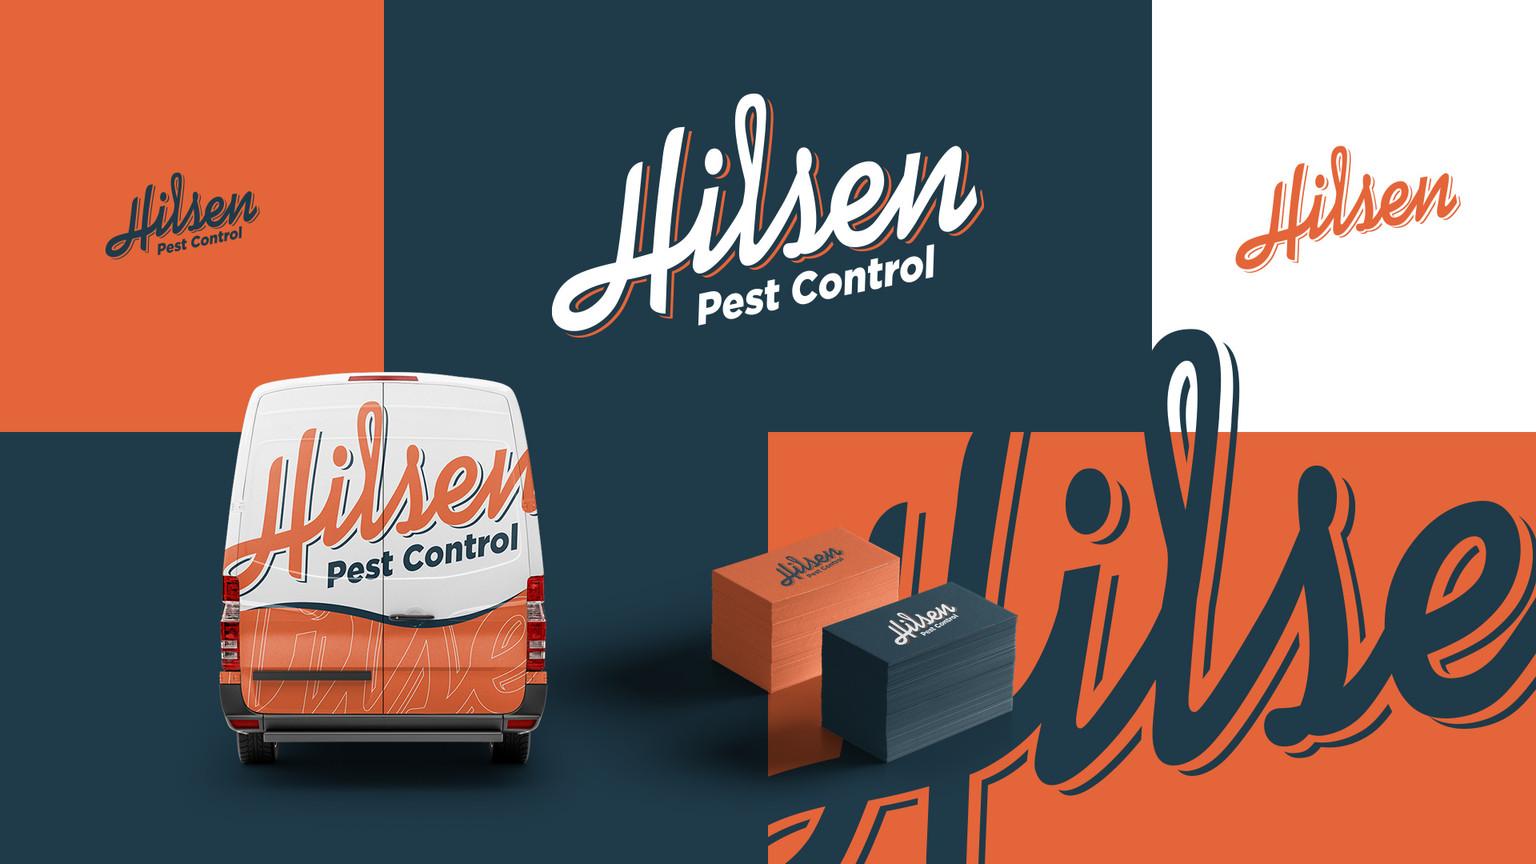 Logo-Presentation-Hilsen.jpg